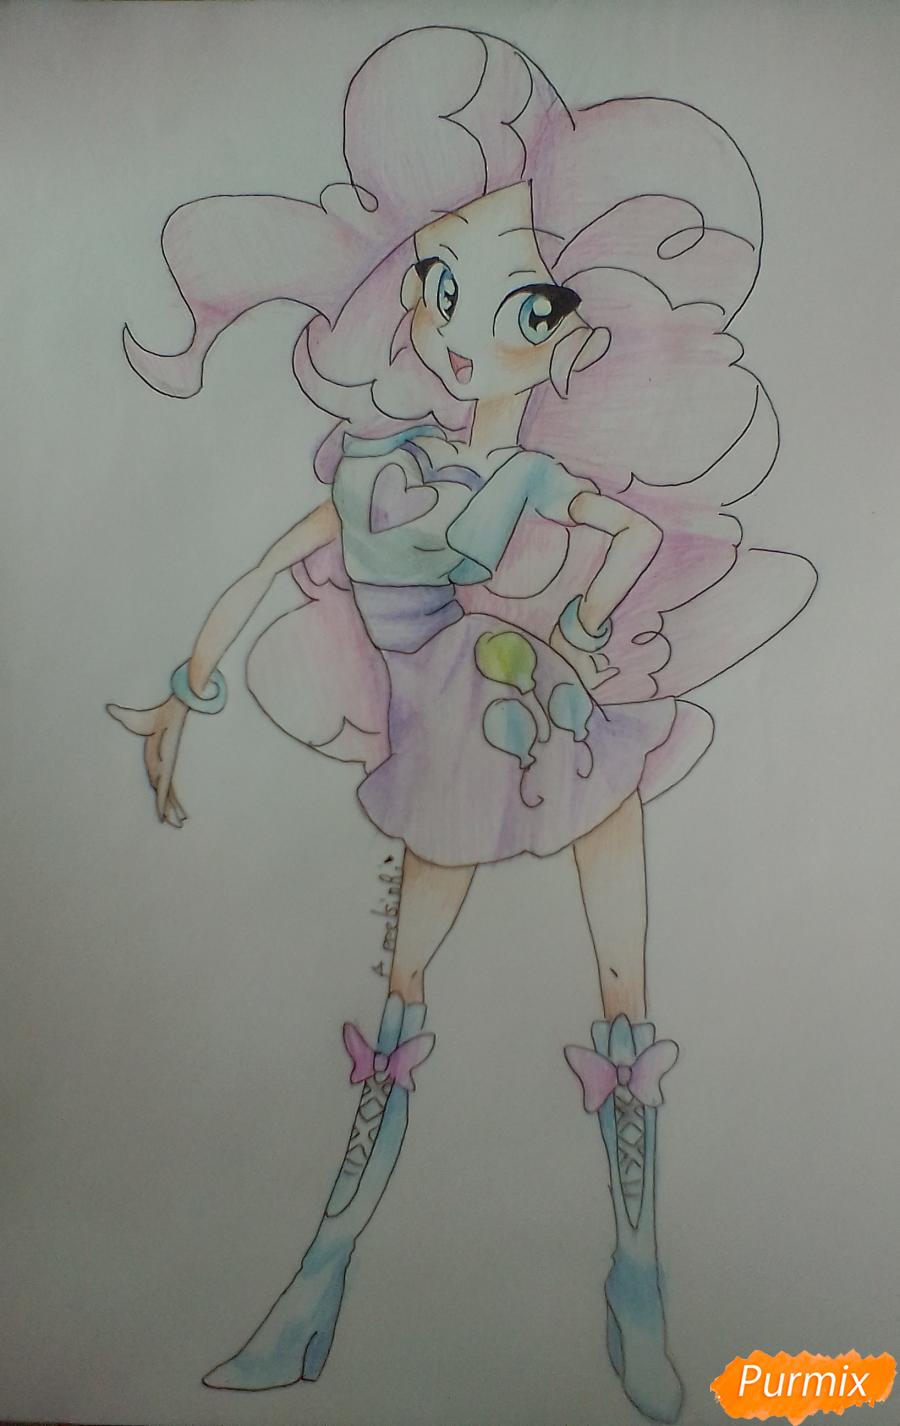 Рисуем Пинки Пай в виде человека карандашами - шаг 12